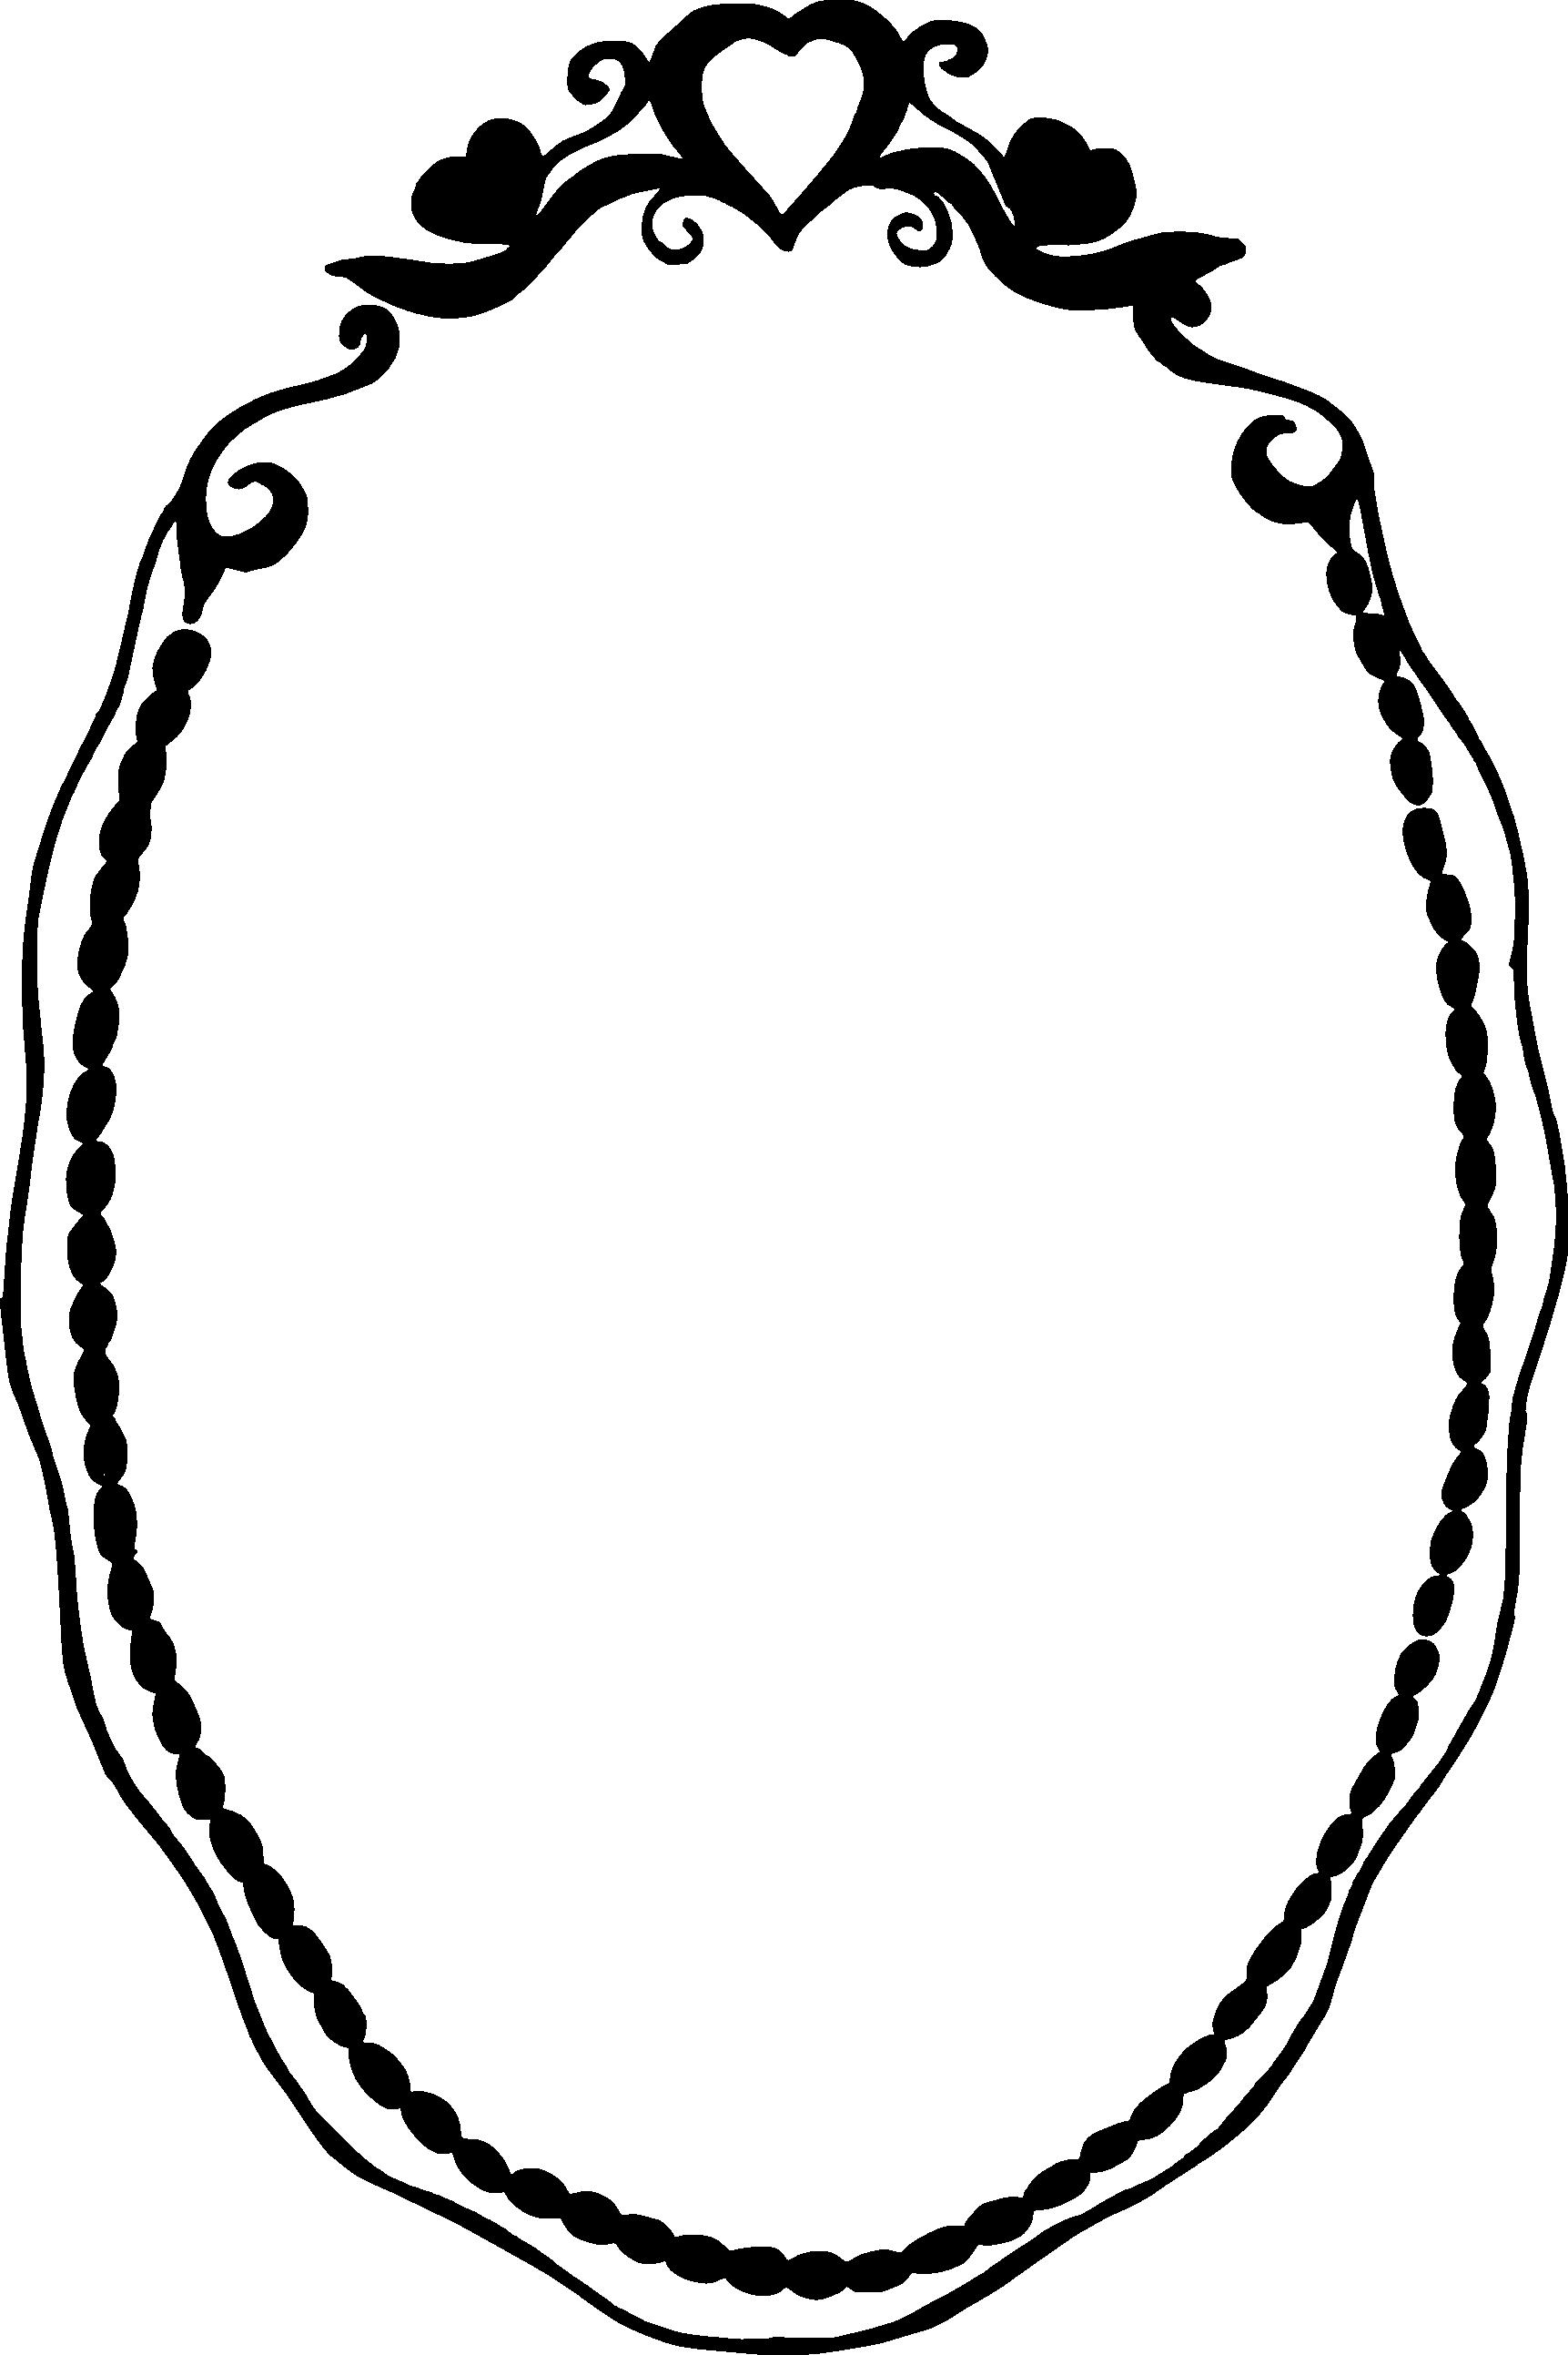 1723x2587 10 Love Romantic Oval Frame Vector (Svg, Png Transparent